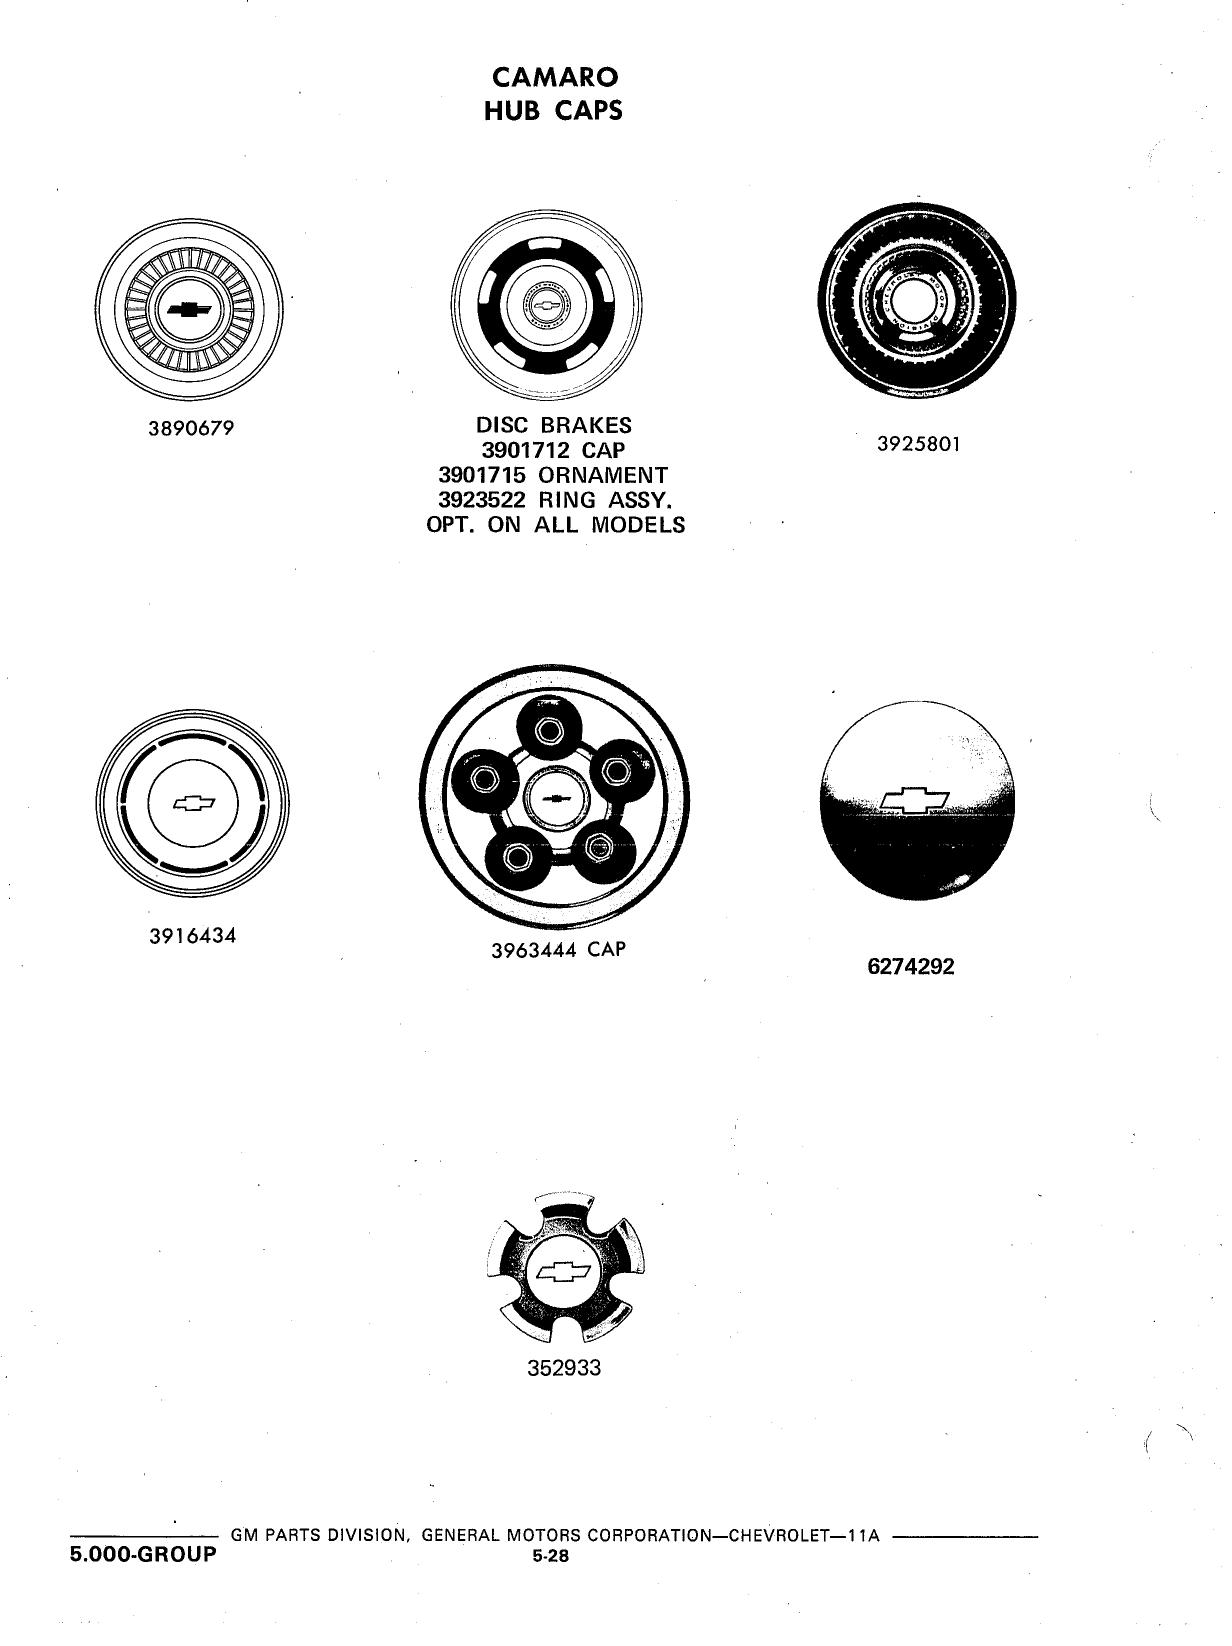 hubcaps.png